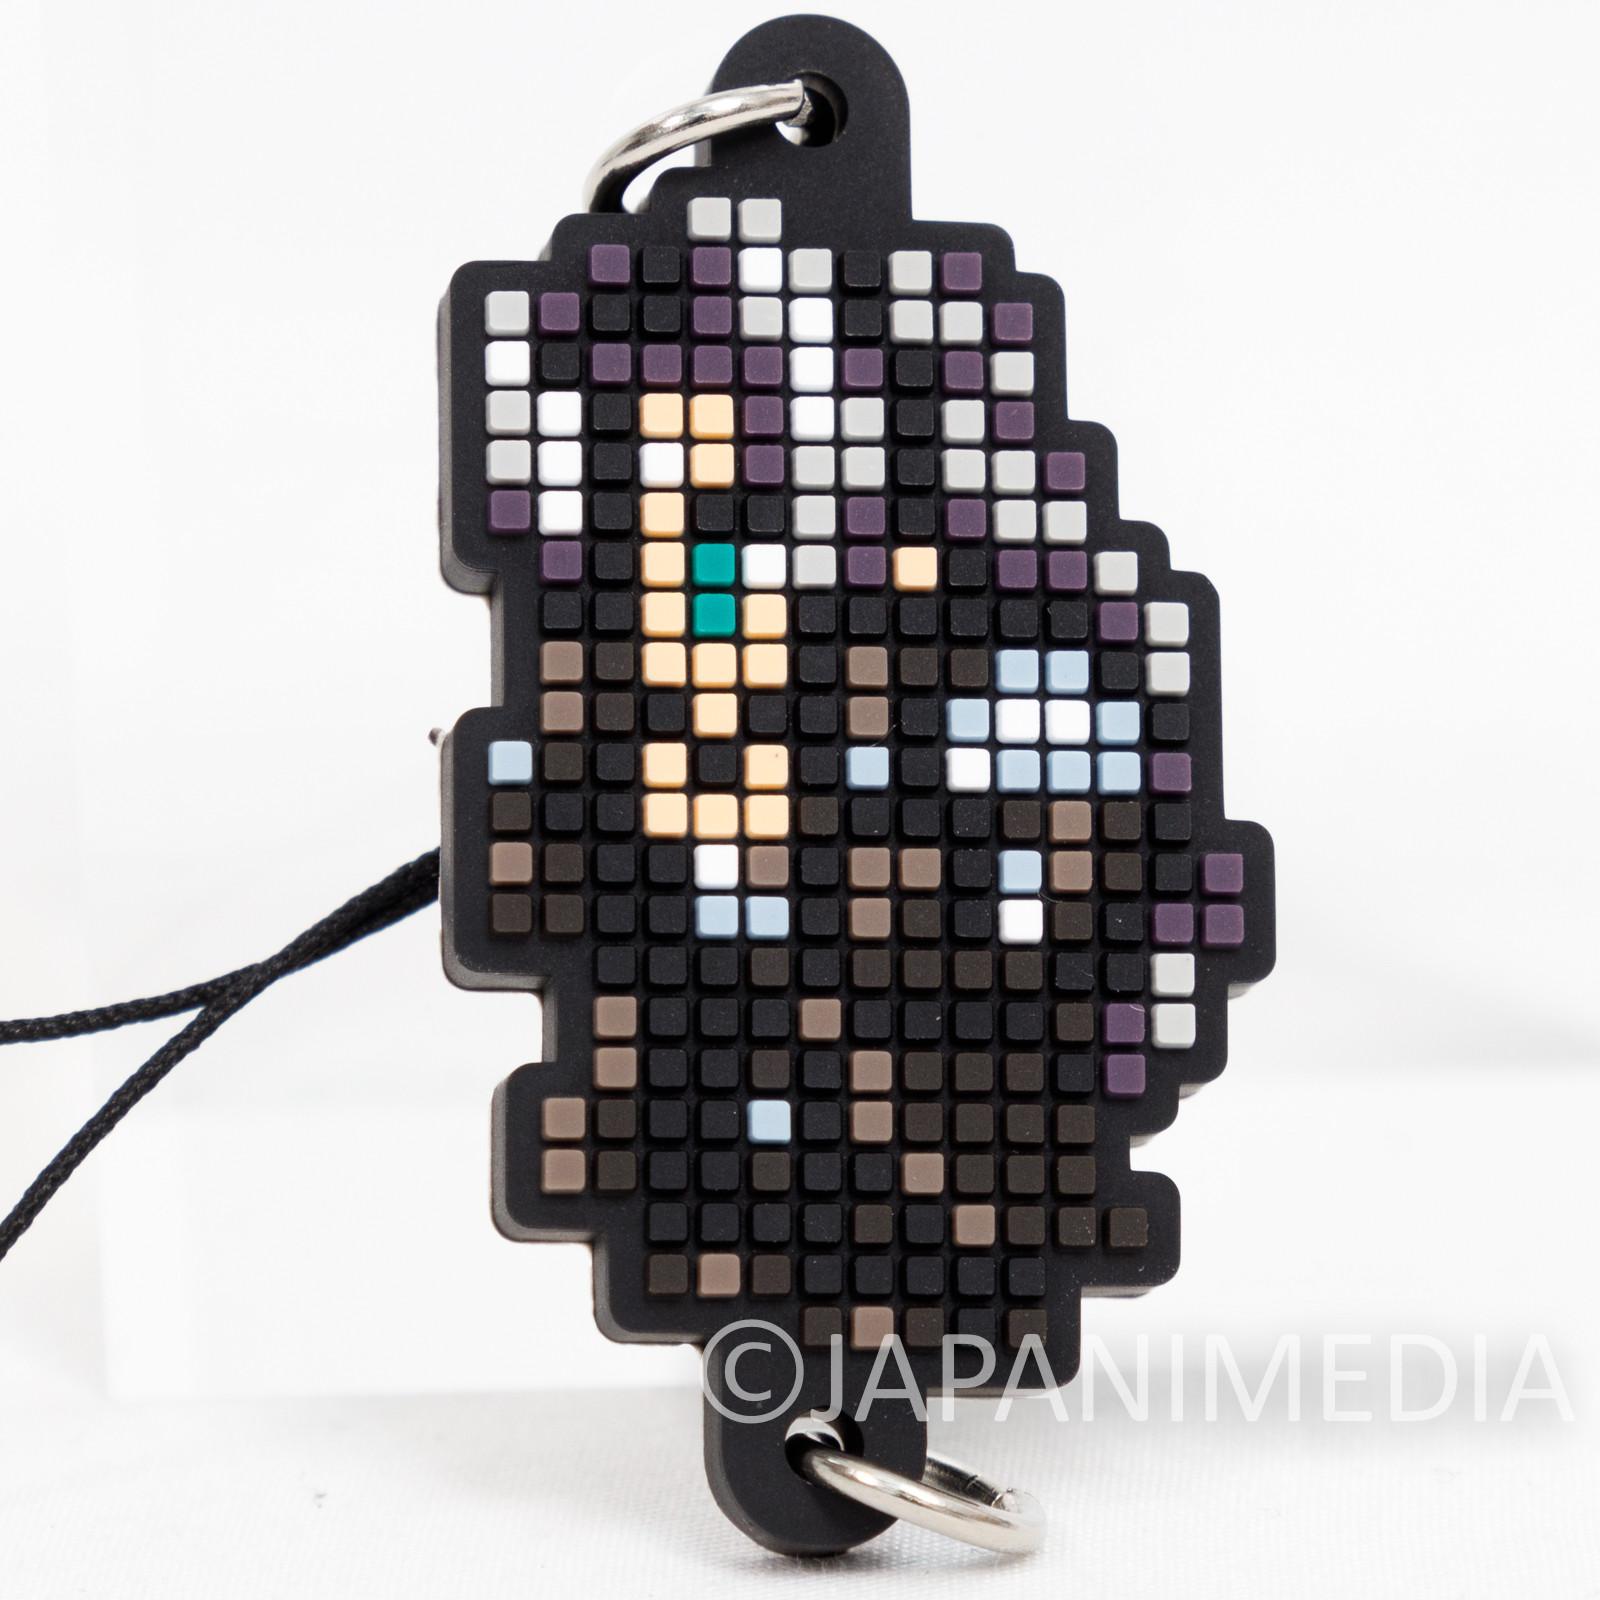 Final Fantasy Tifa Lockhart Dot Design Rubber Mascot Strap Square Enix